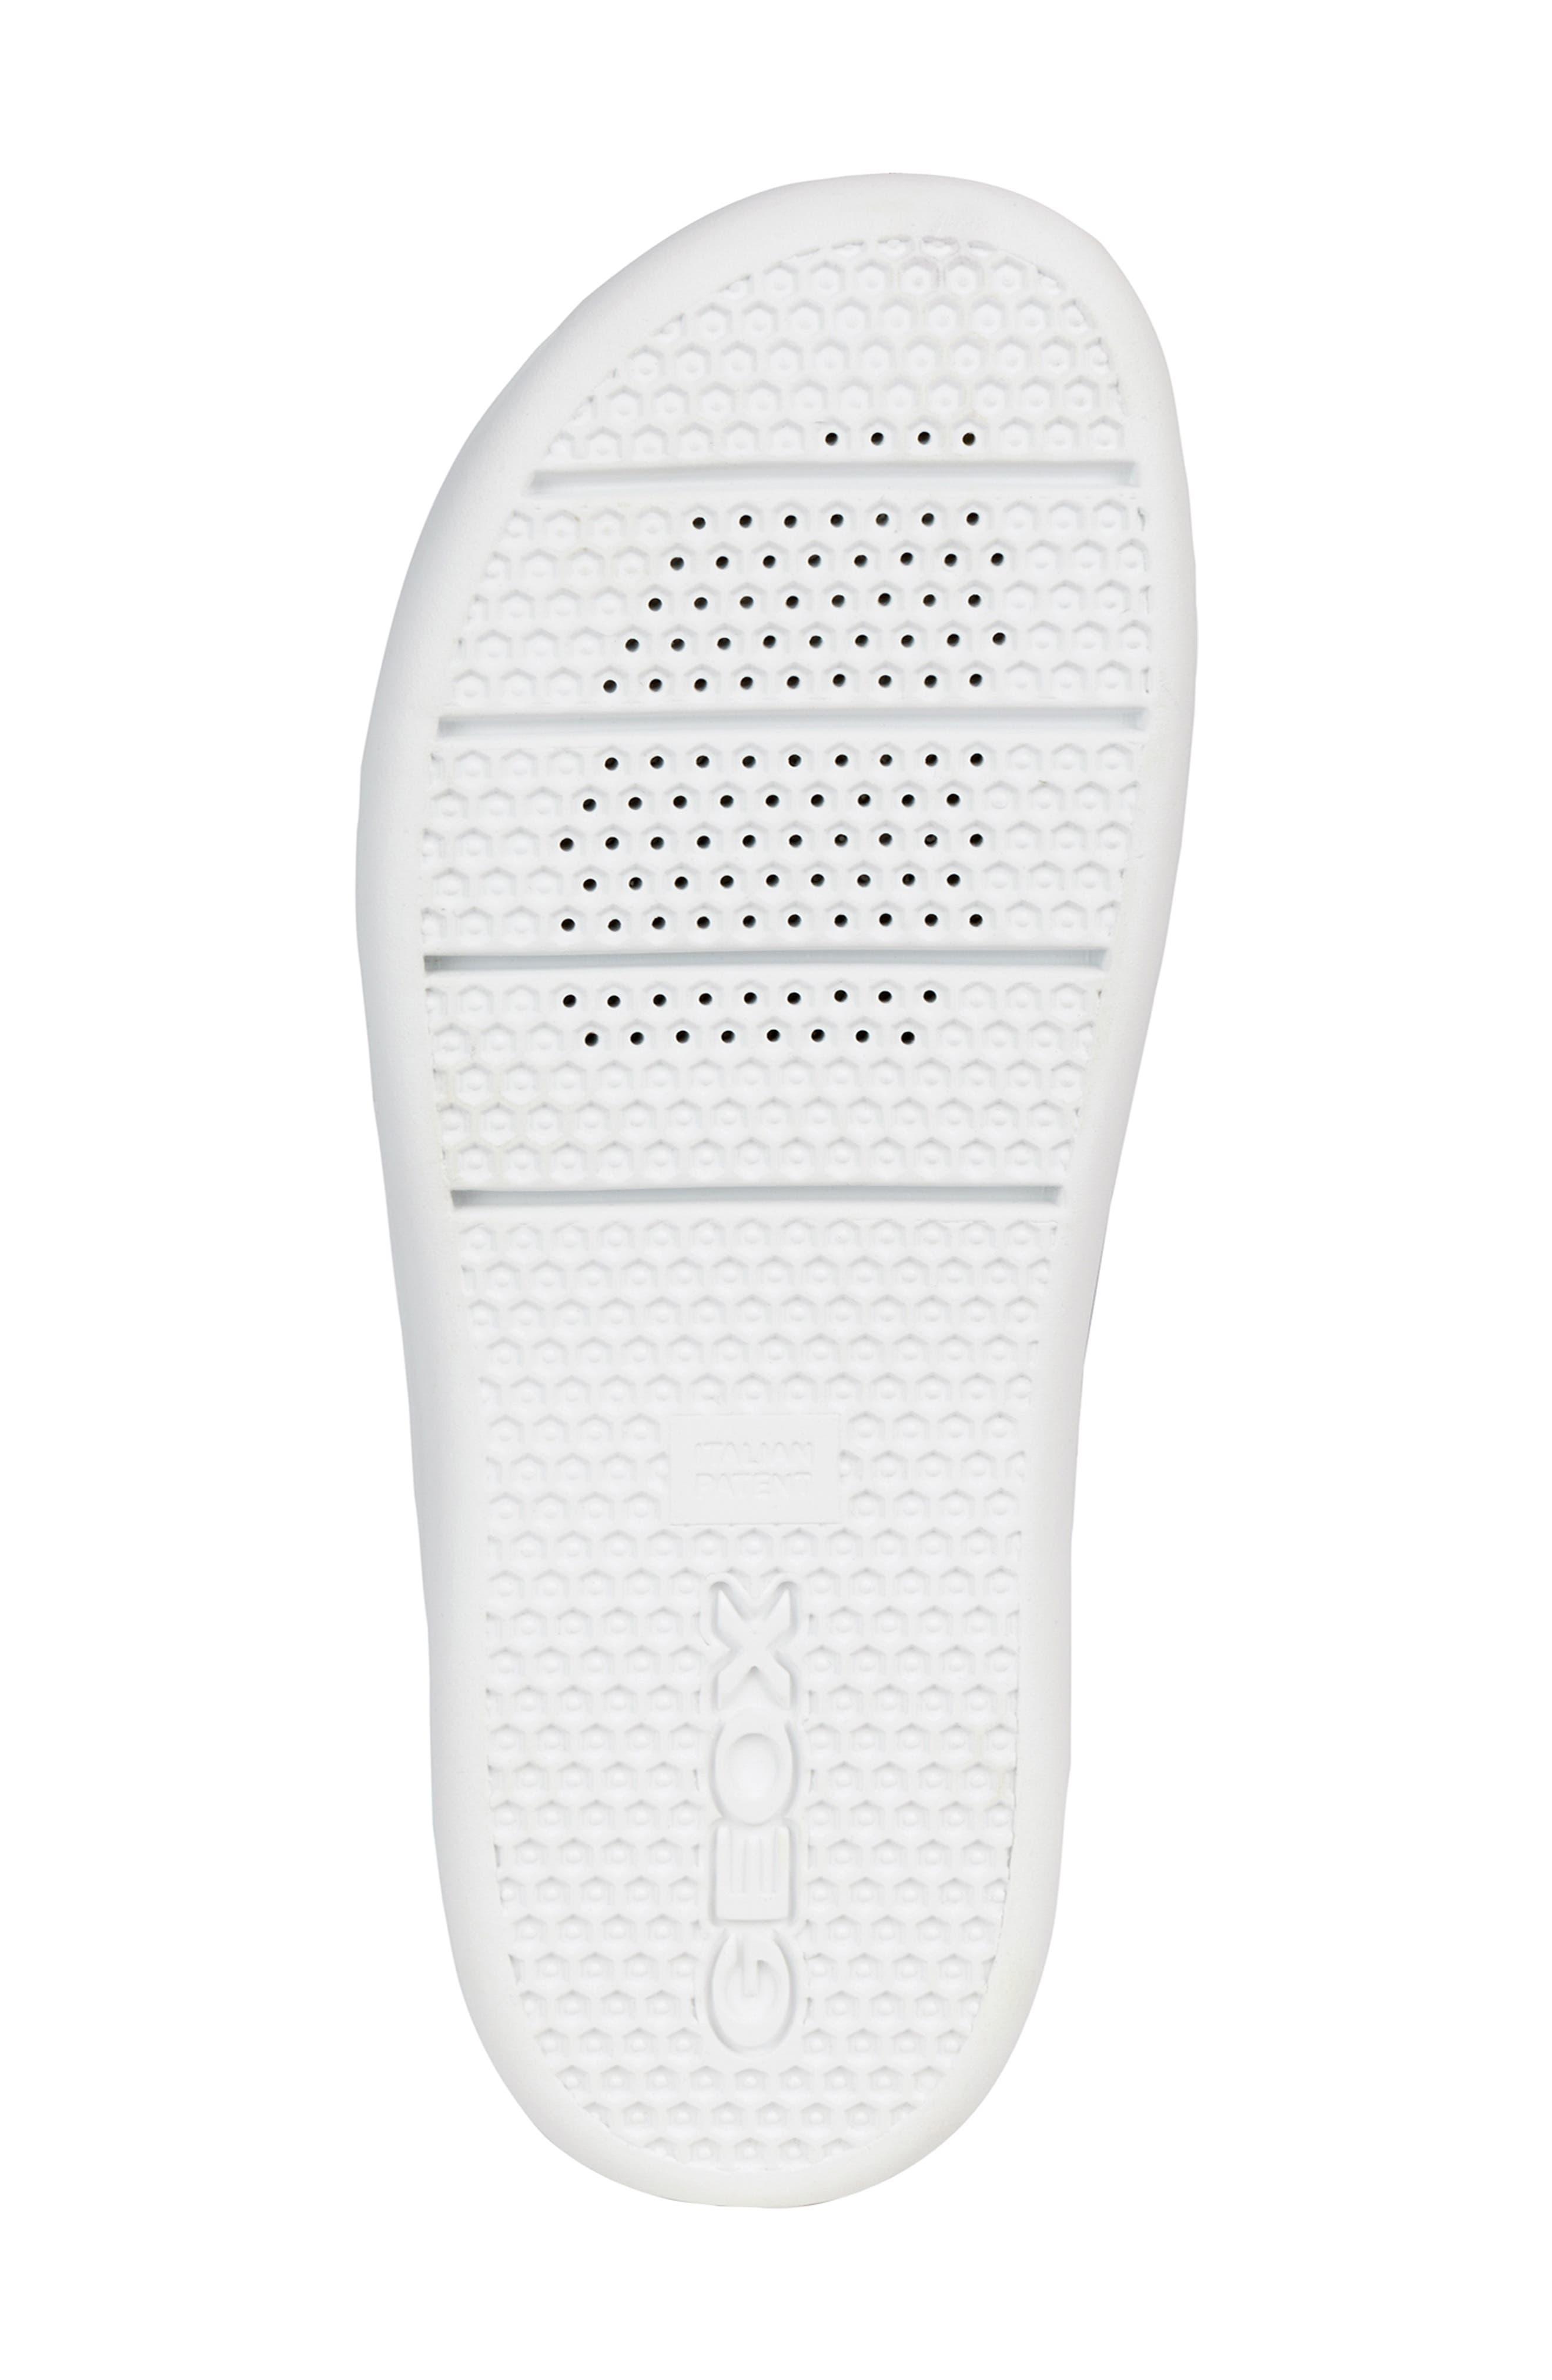 GEOX, Ottaya Studded Slide Sandal, Alternate thumbnail 6, color, BLACK LEATHER